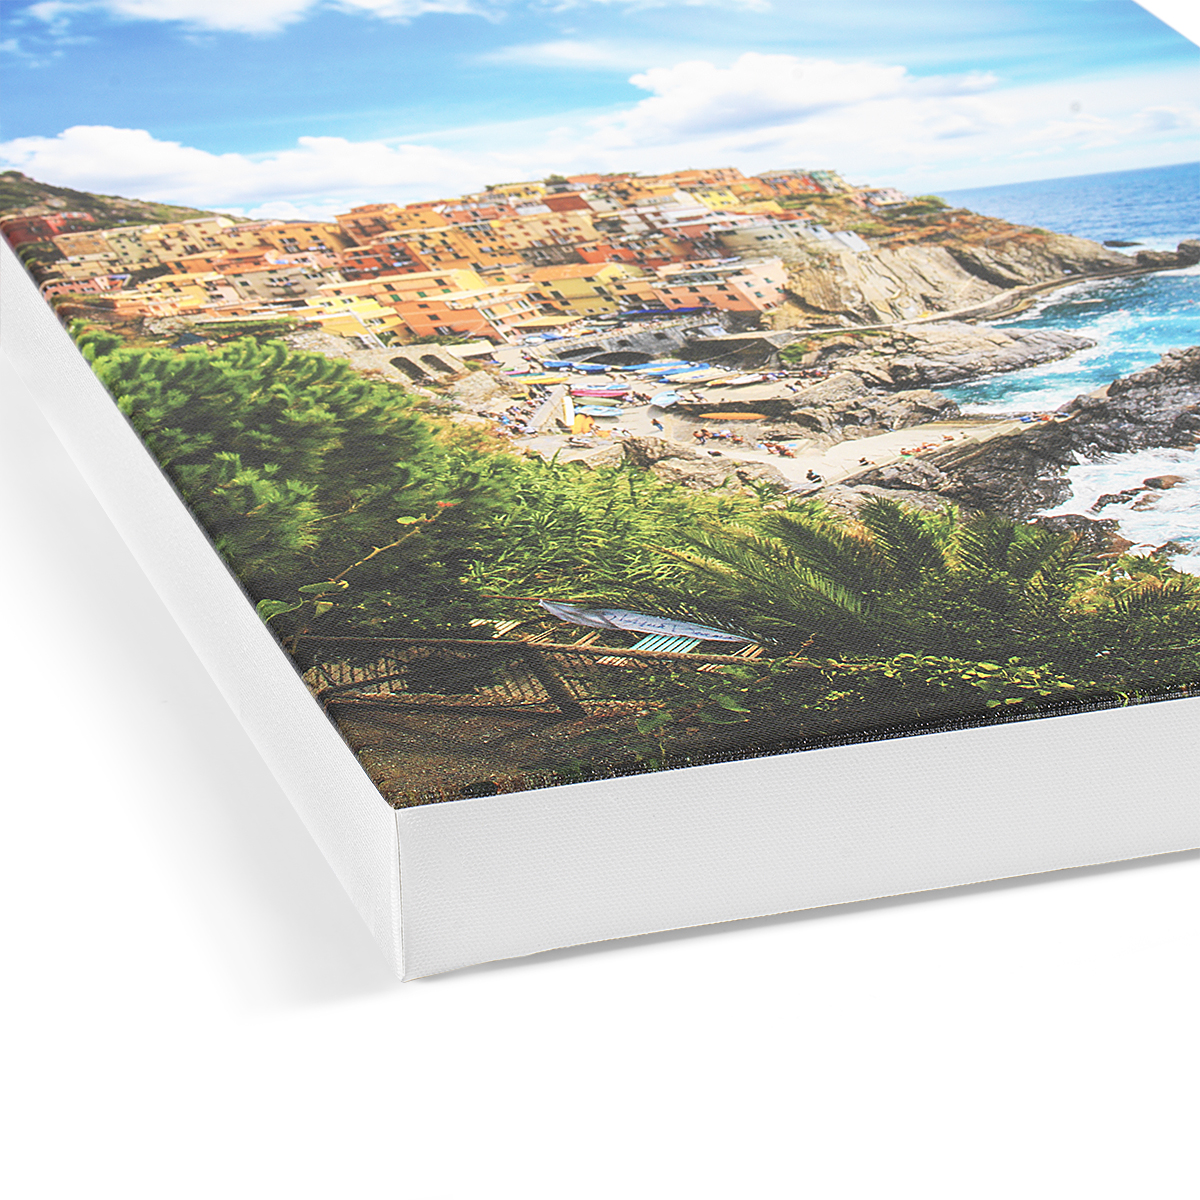 High Quality Digital Photo to Canvas Prints White Wrap